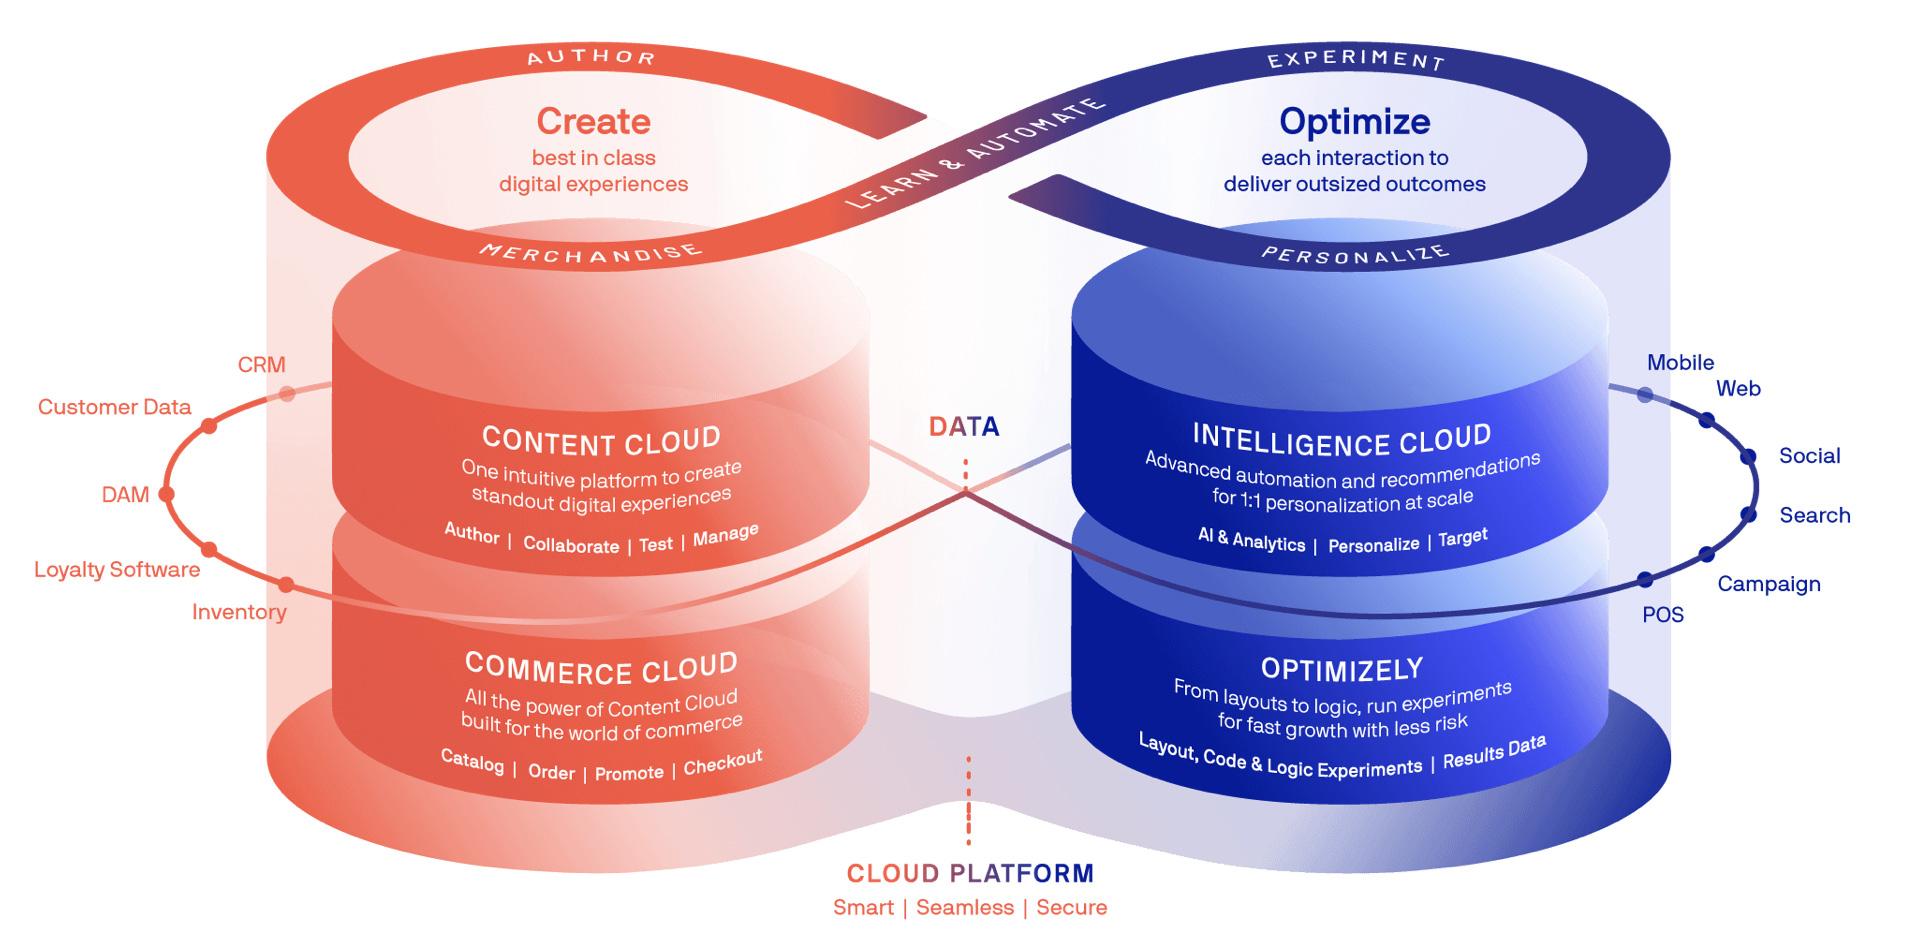 A diagram of the Episerver digital experience platform